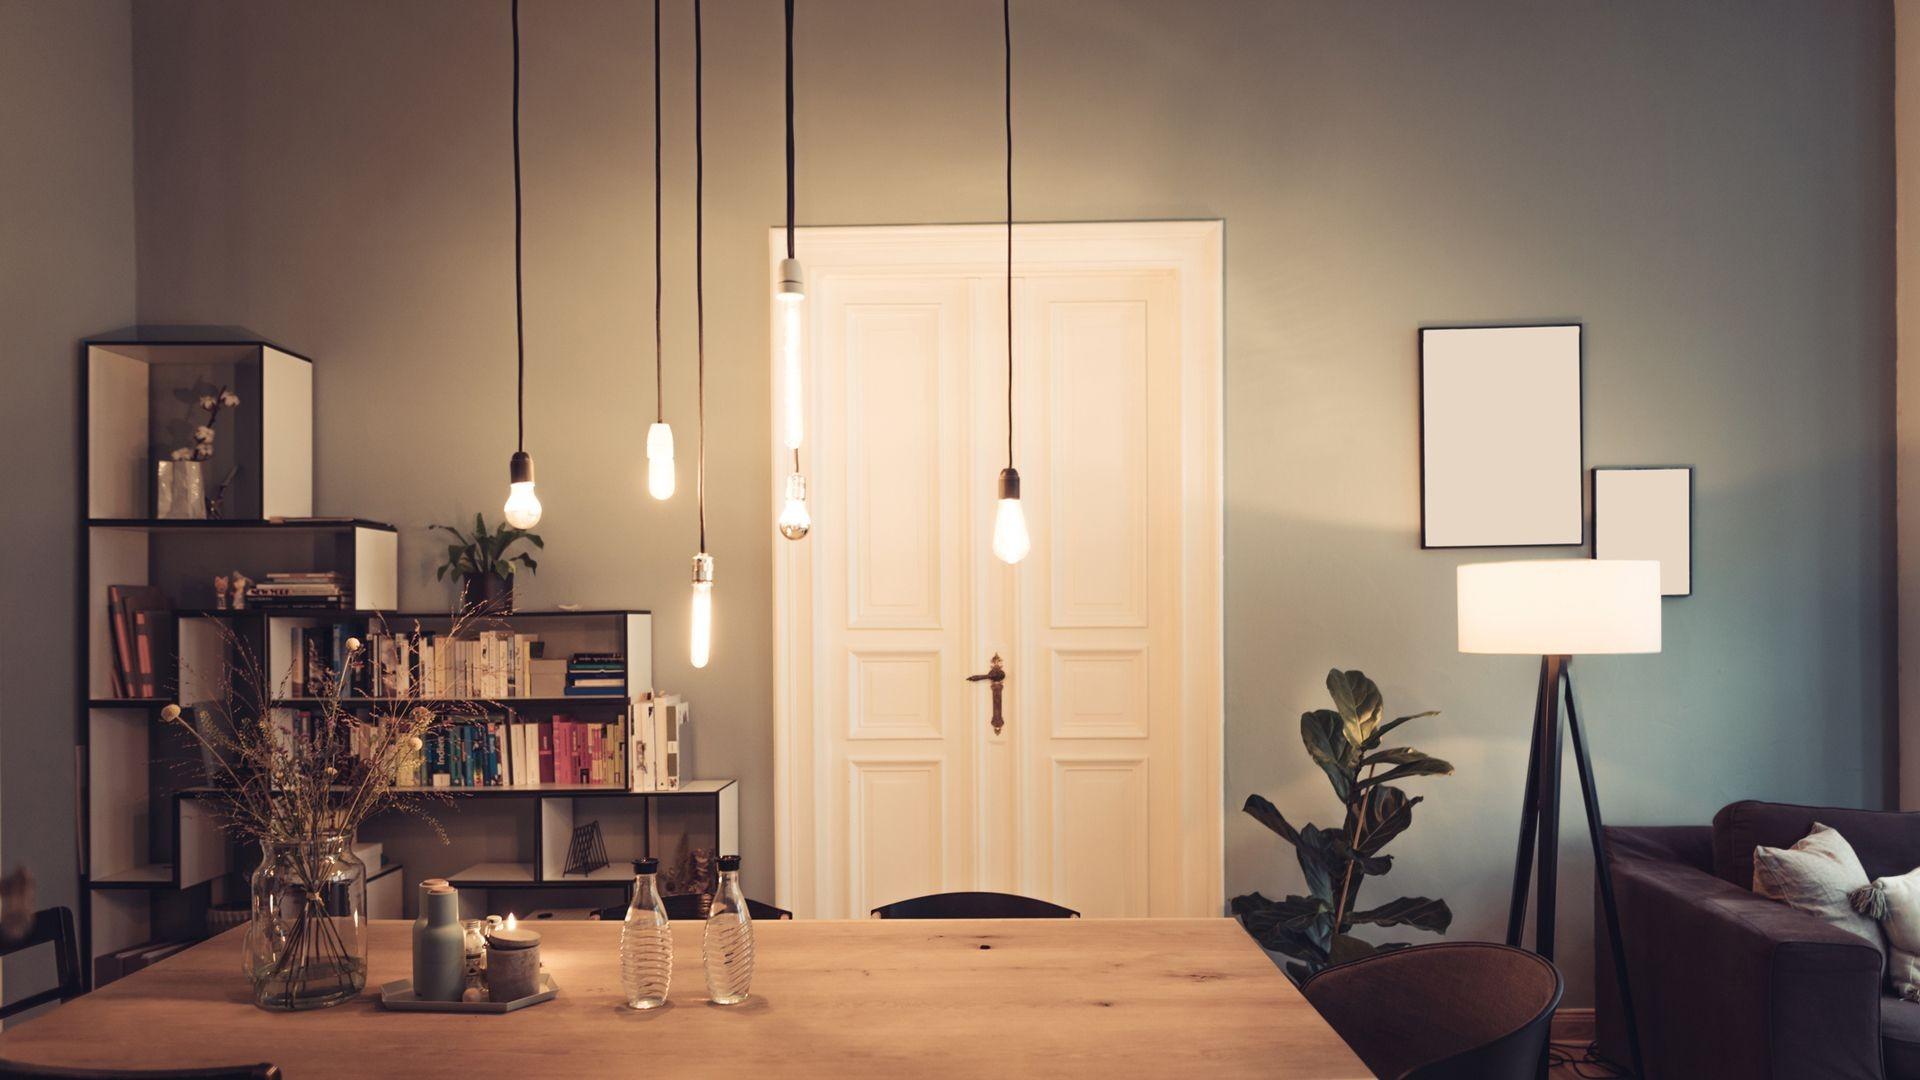 Instalación de luz led en A Coruña